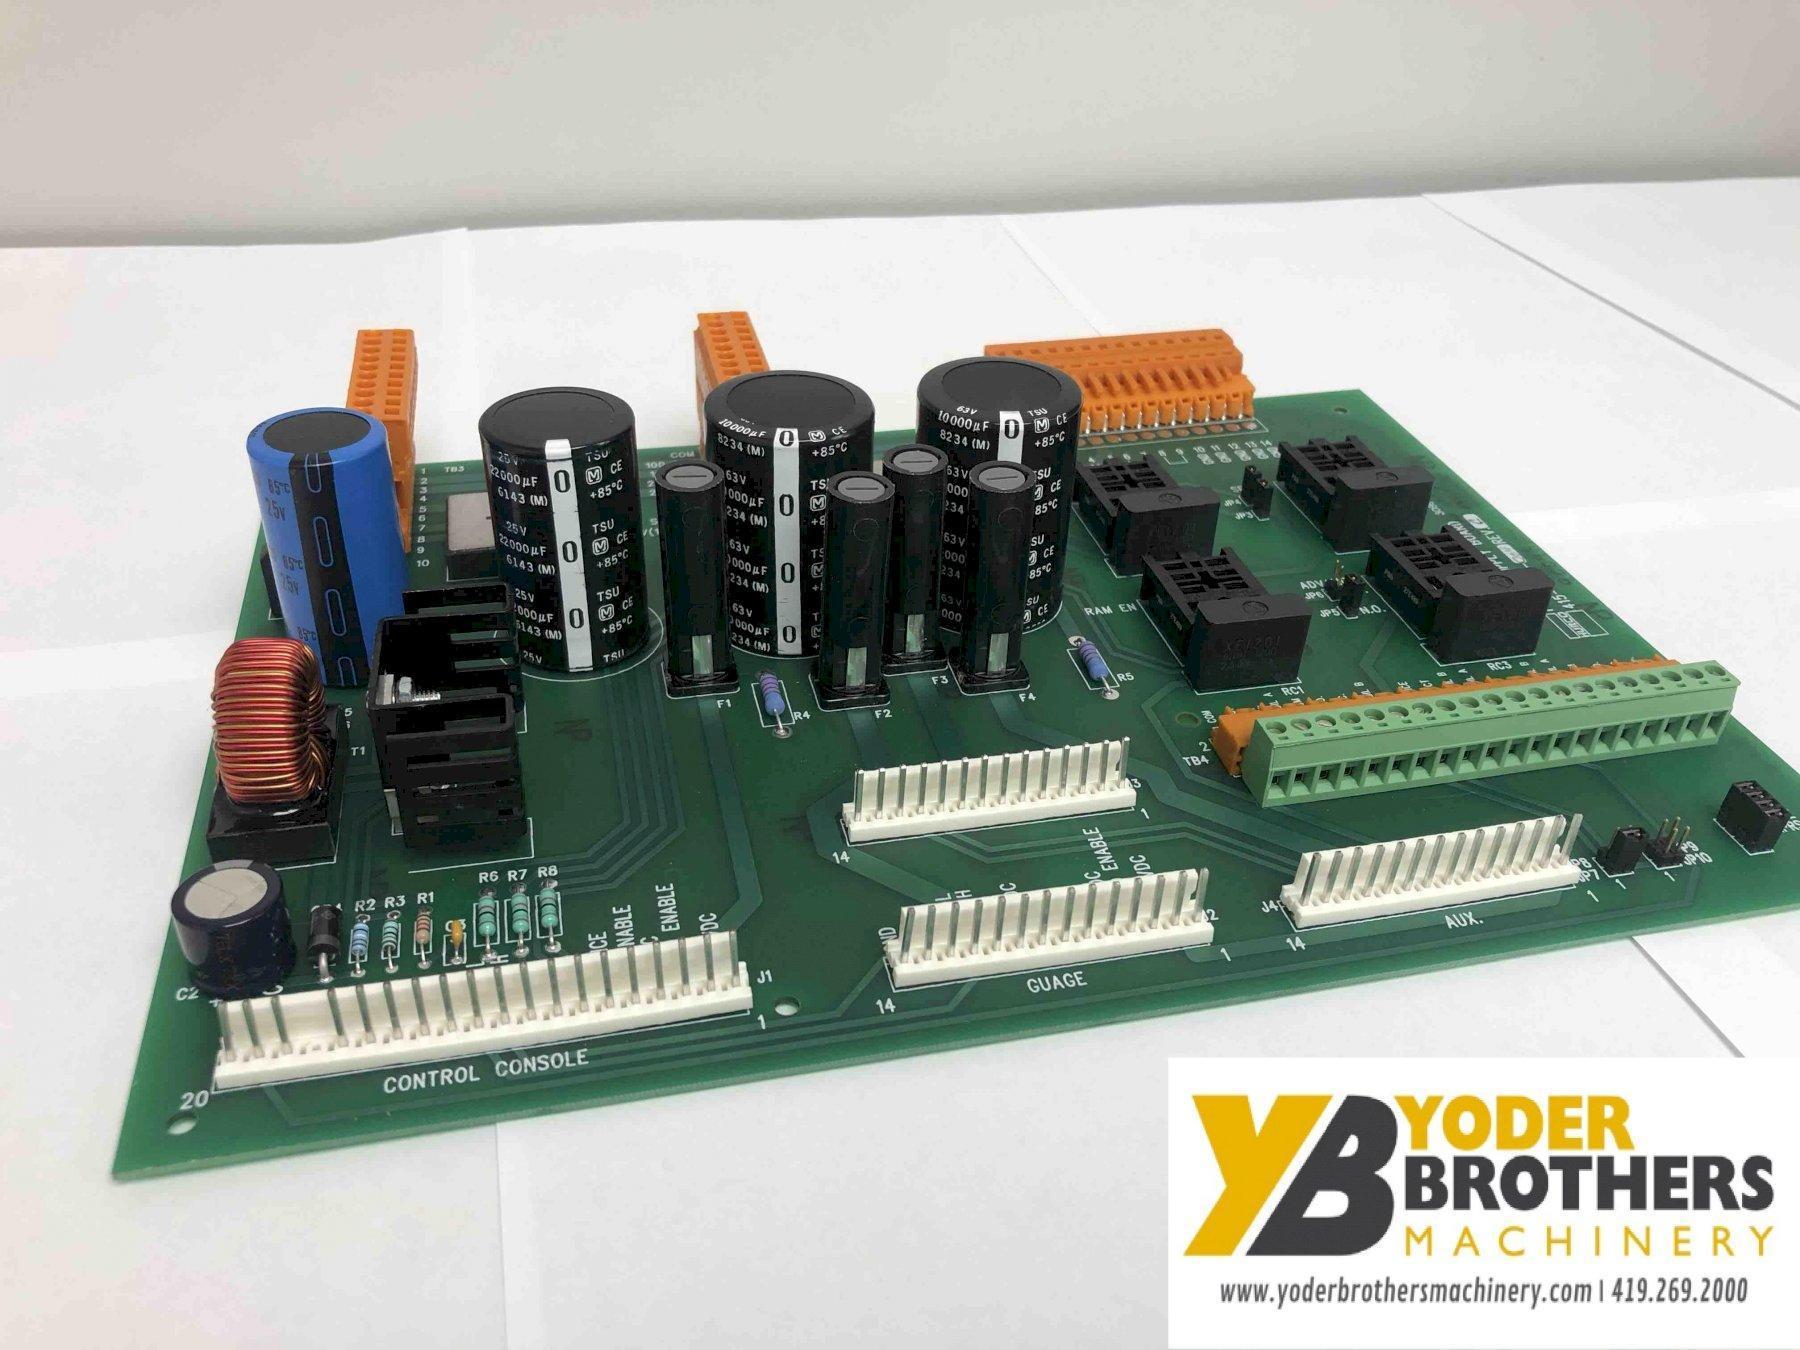 Press Brake Power Supply; Stock #13254